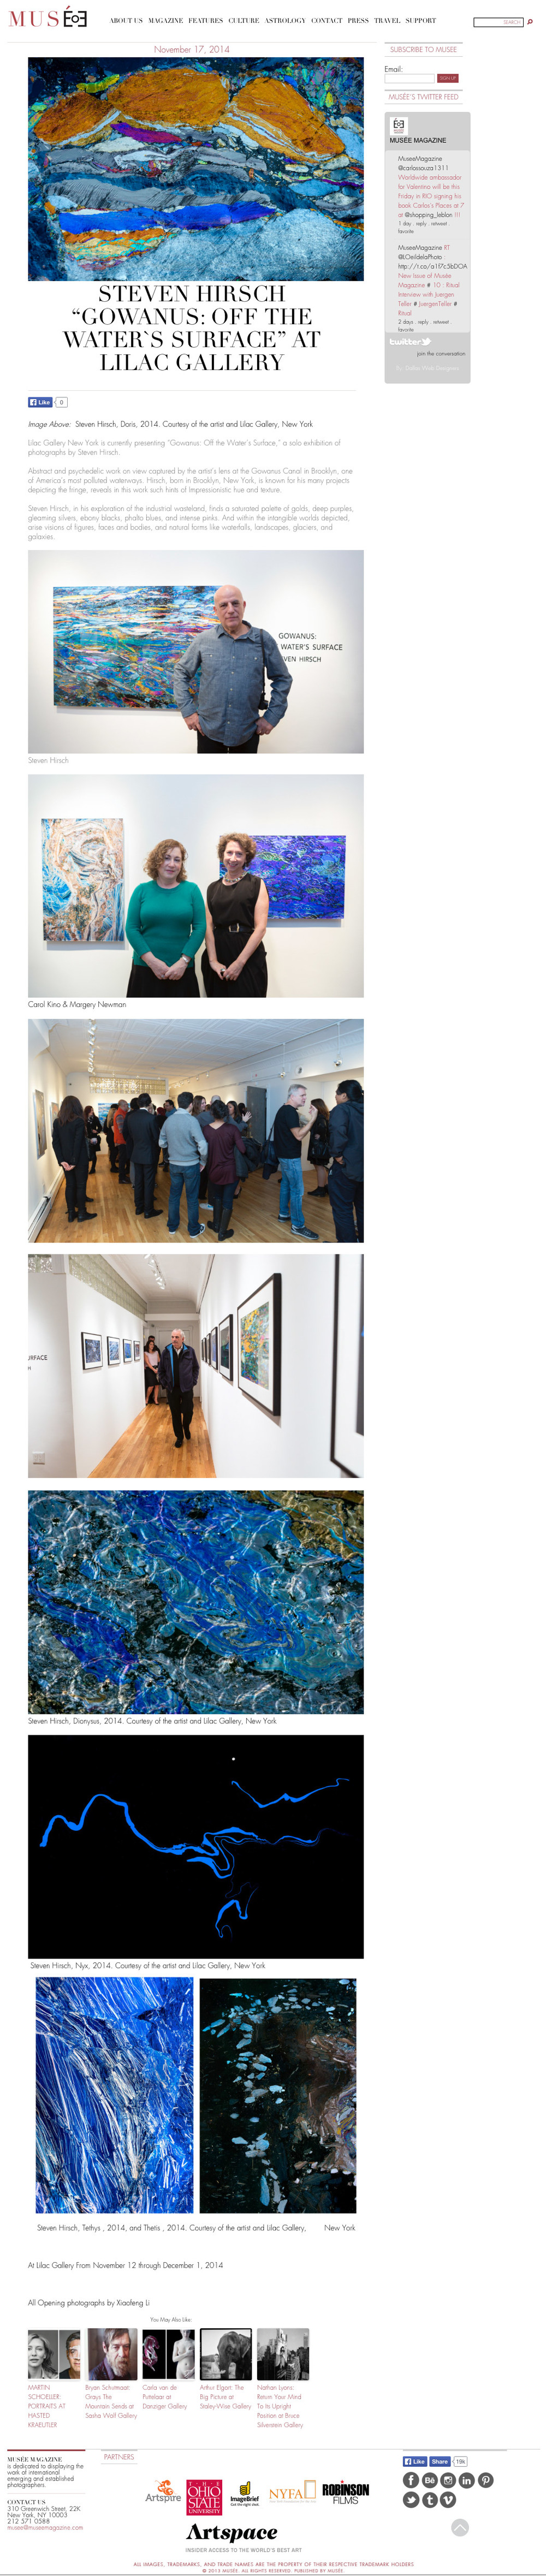 lilacgallery-museemagazine